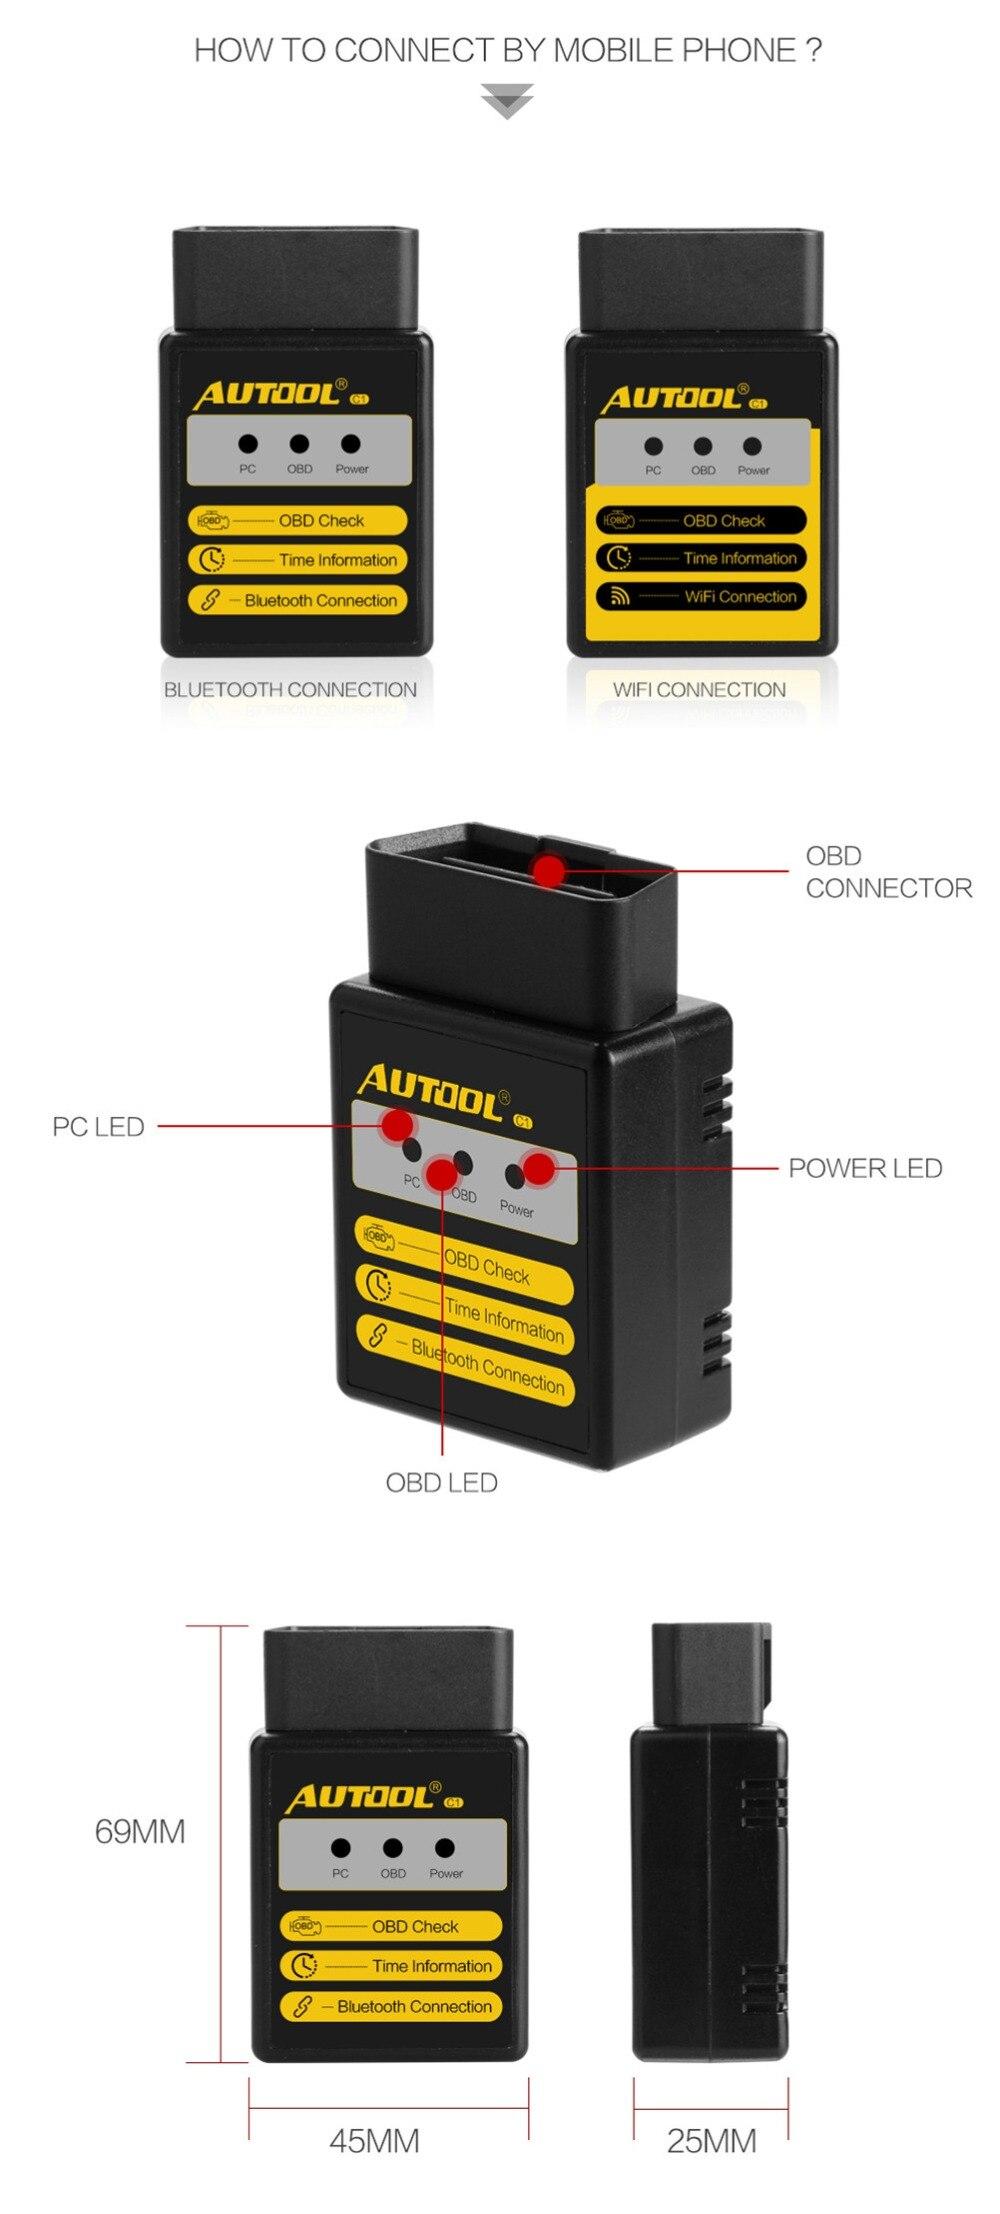 AUTOOL CI Bluetooth  (1)